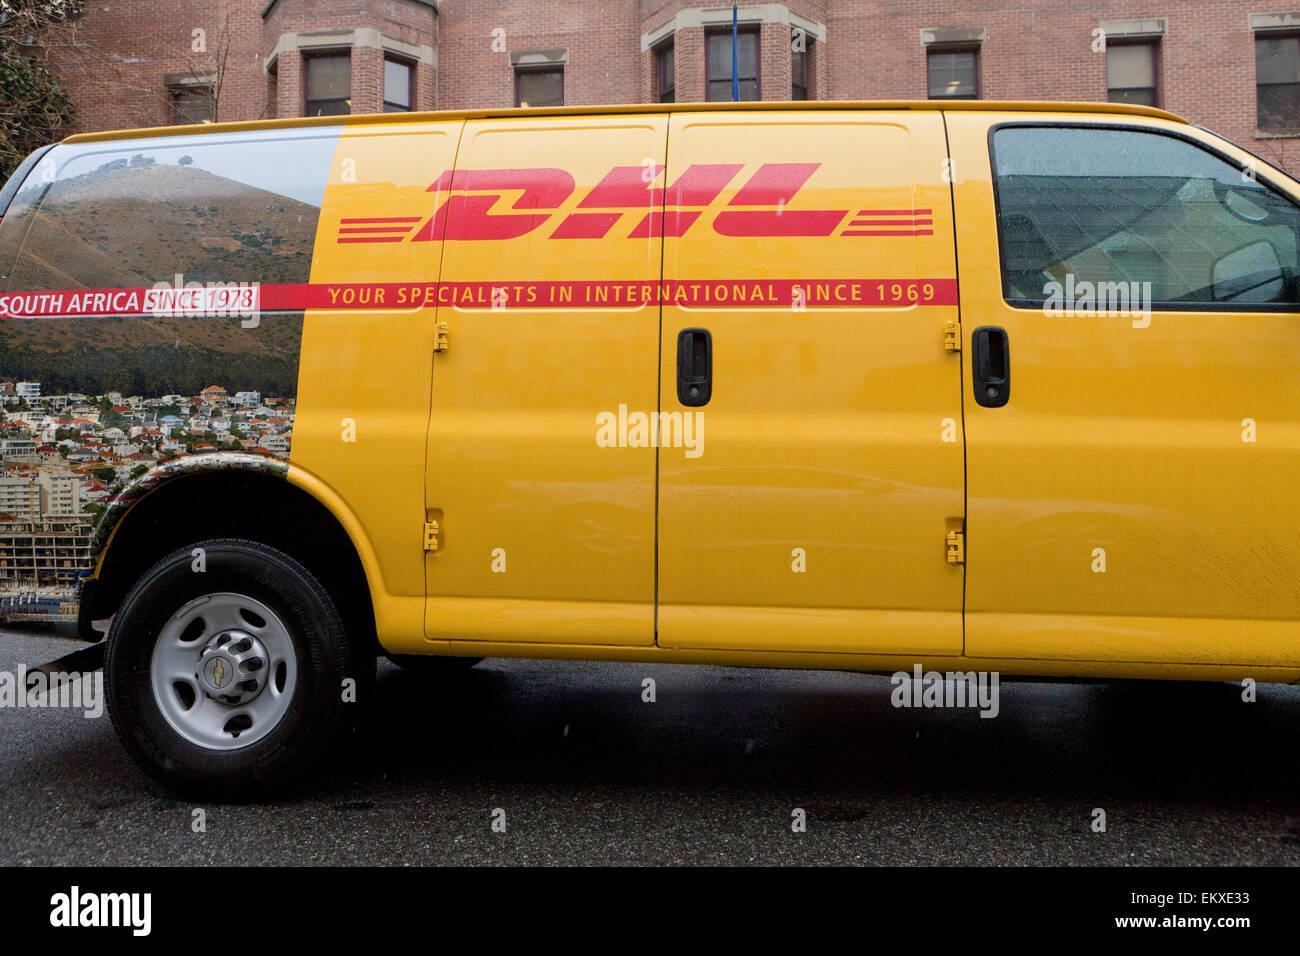 DHL delivery van - Washington, DC USA Stock Photo: 81101751